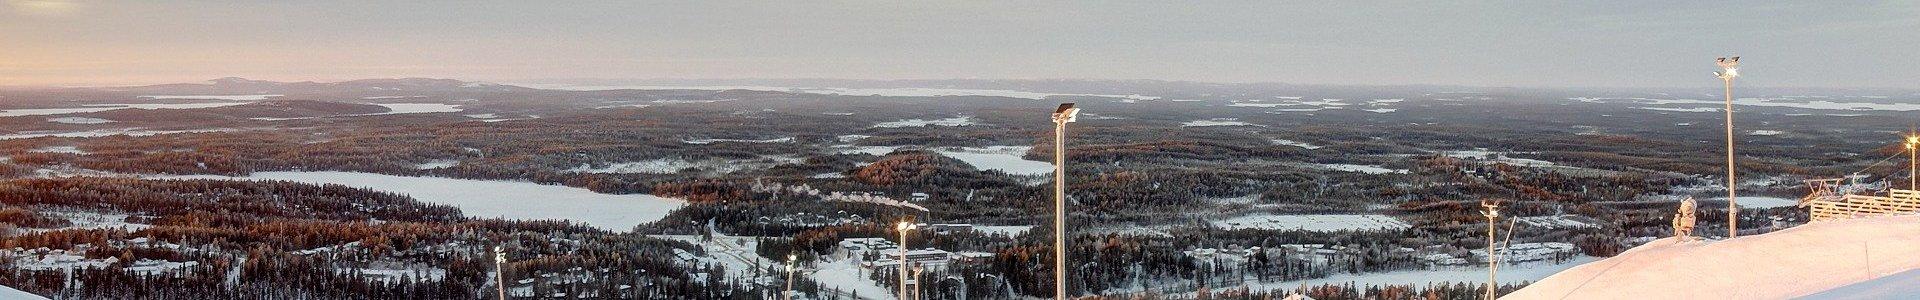 Горнолыжный курорт Ruka, Финляндия